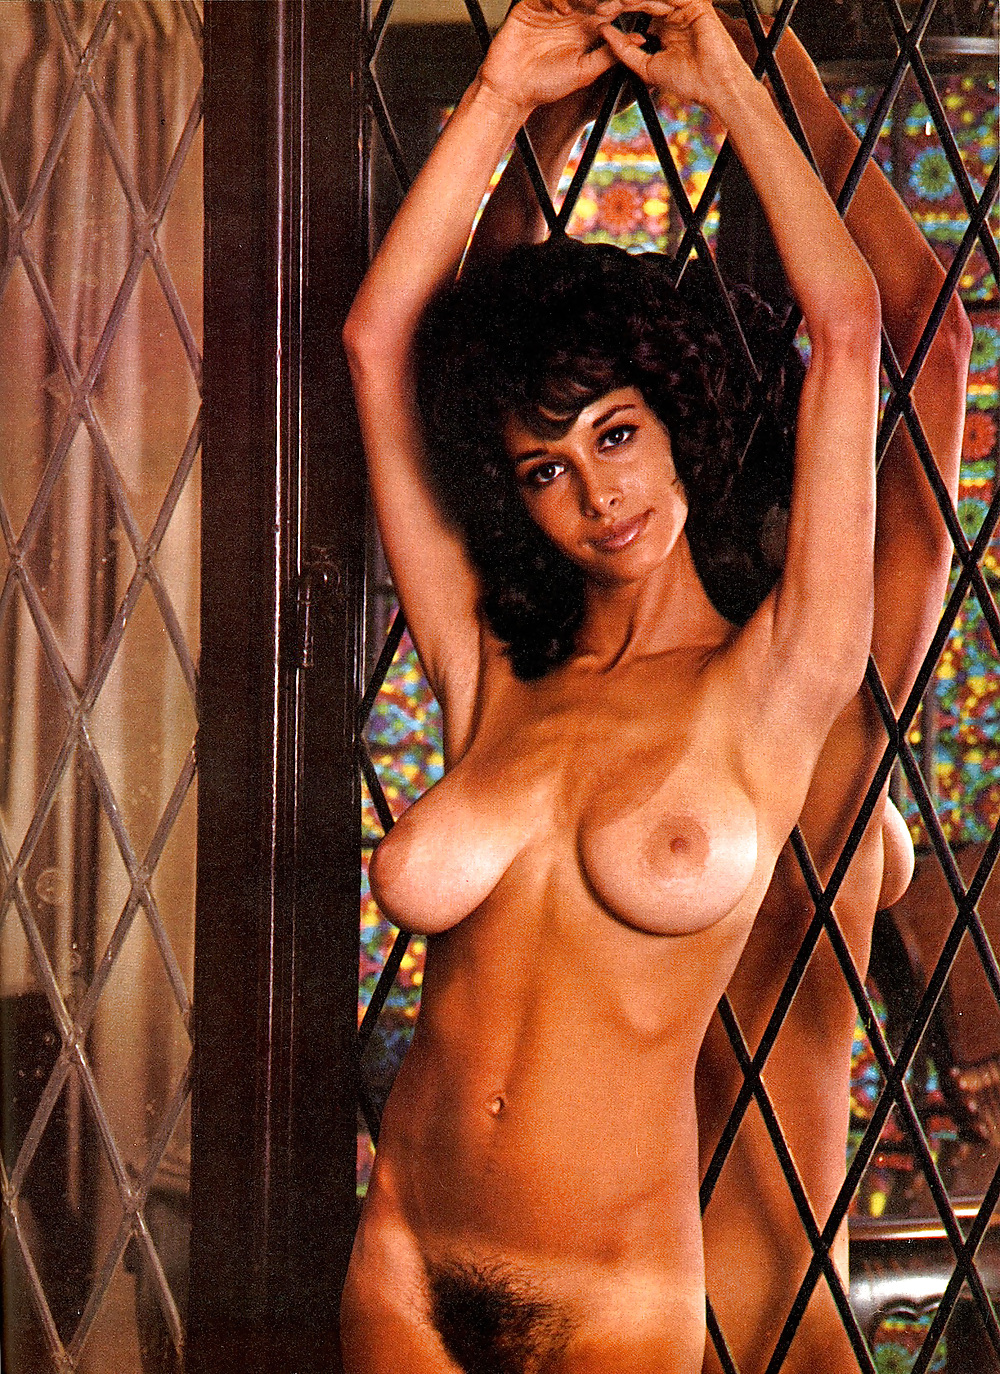 Elaine benice nude cockriding gif hose